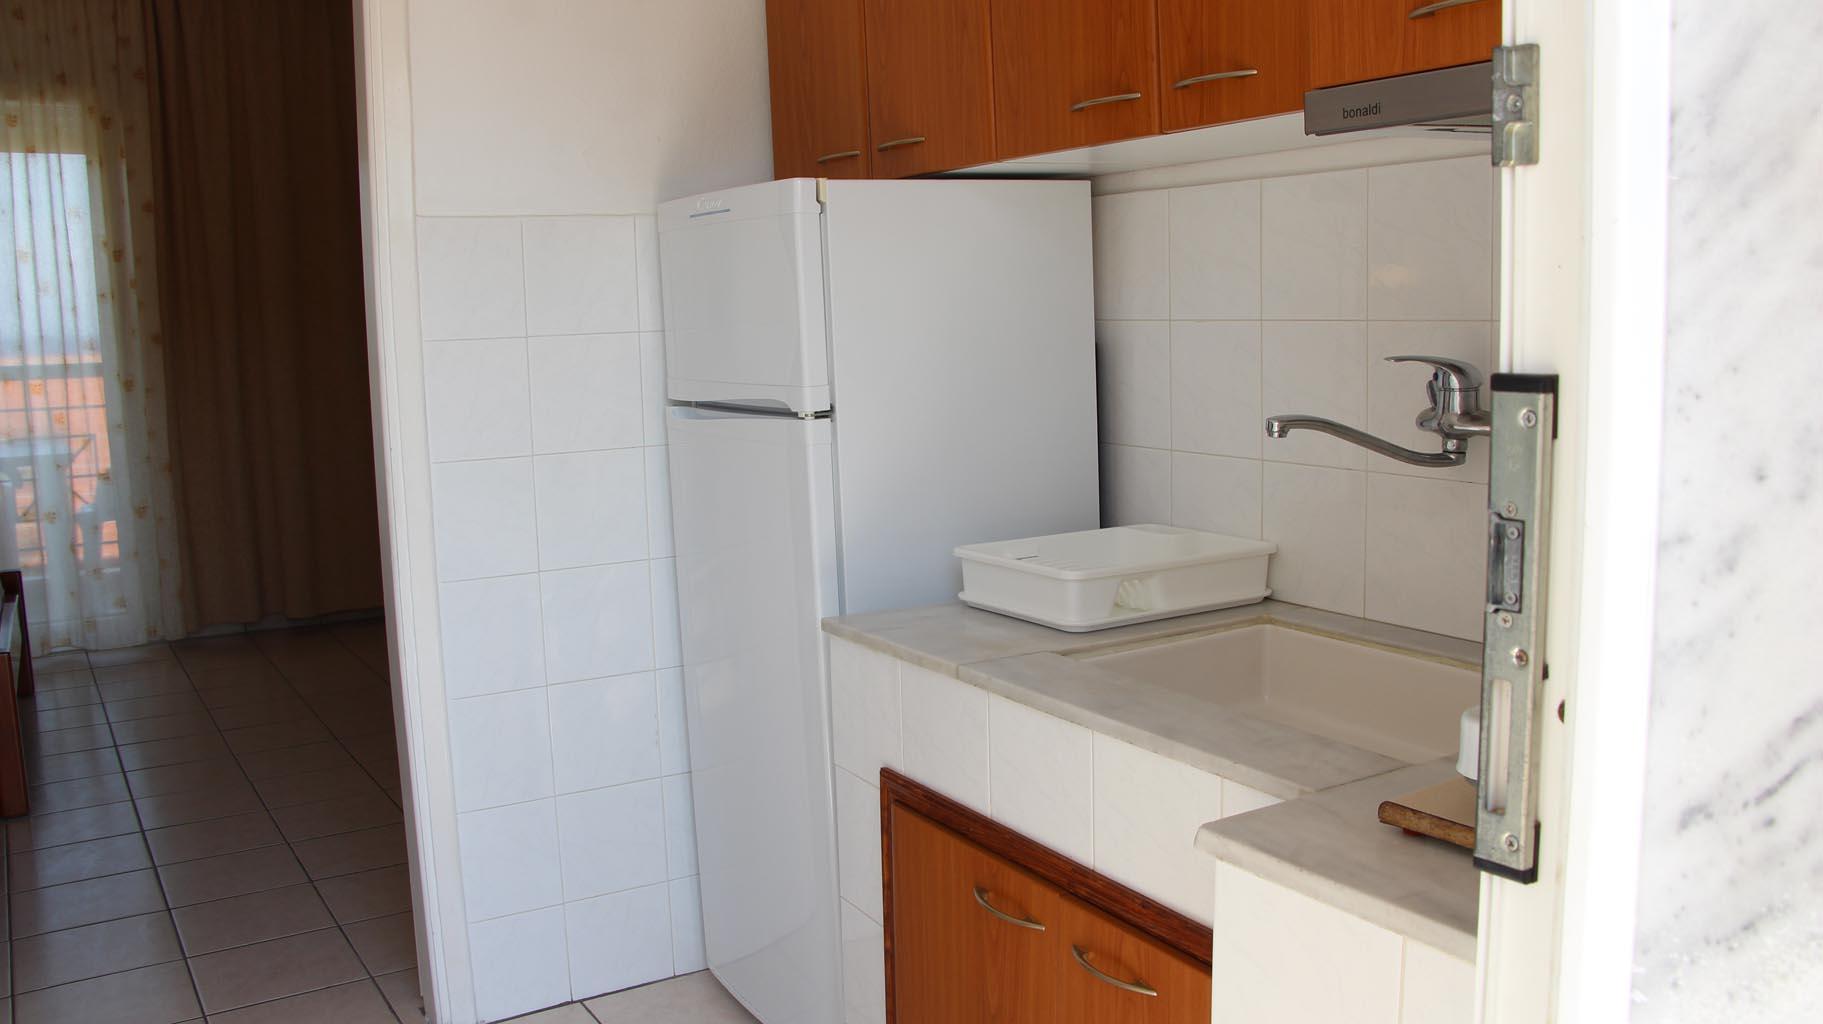 letovanje/grcka/plihrono/bglucky4/teramvos/studio-kitchenette-2.JPG